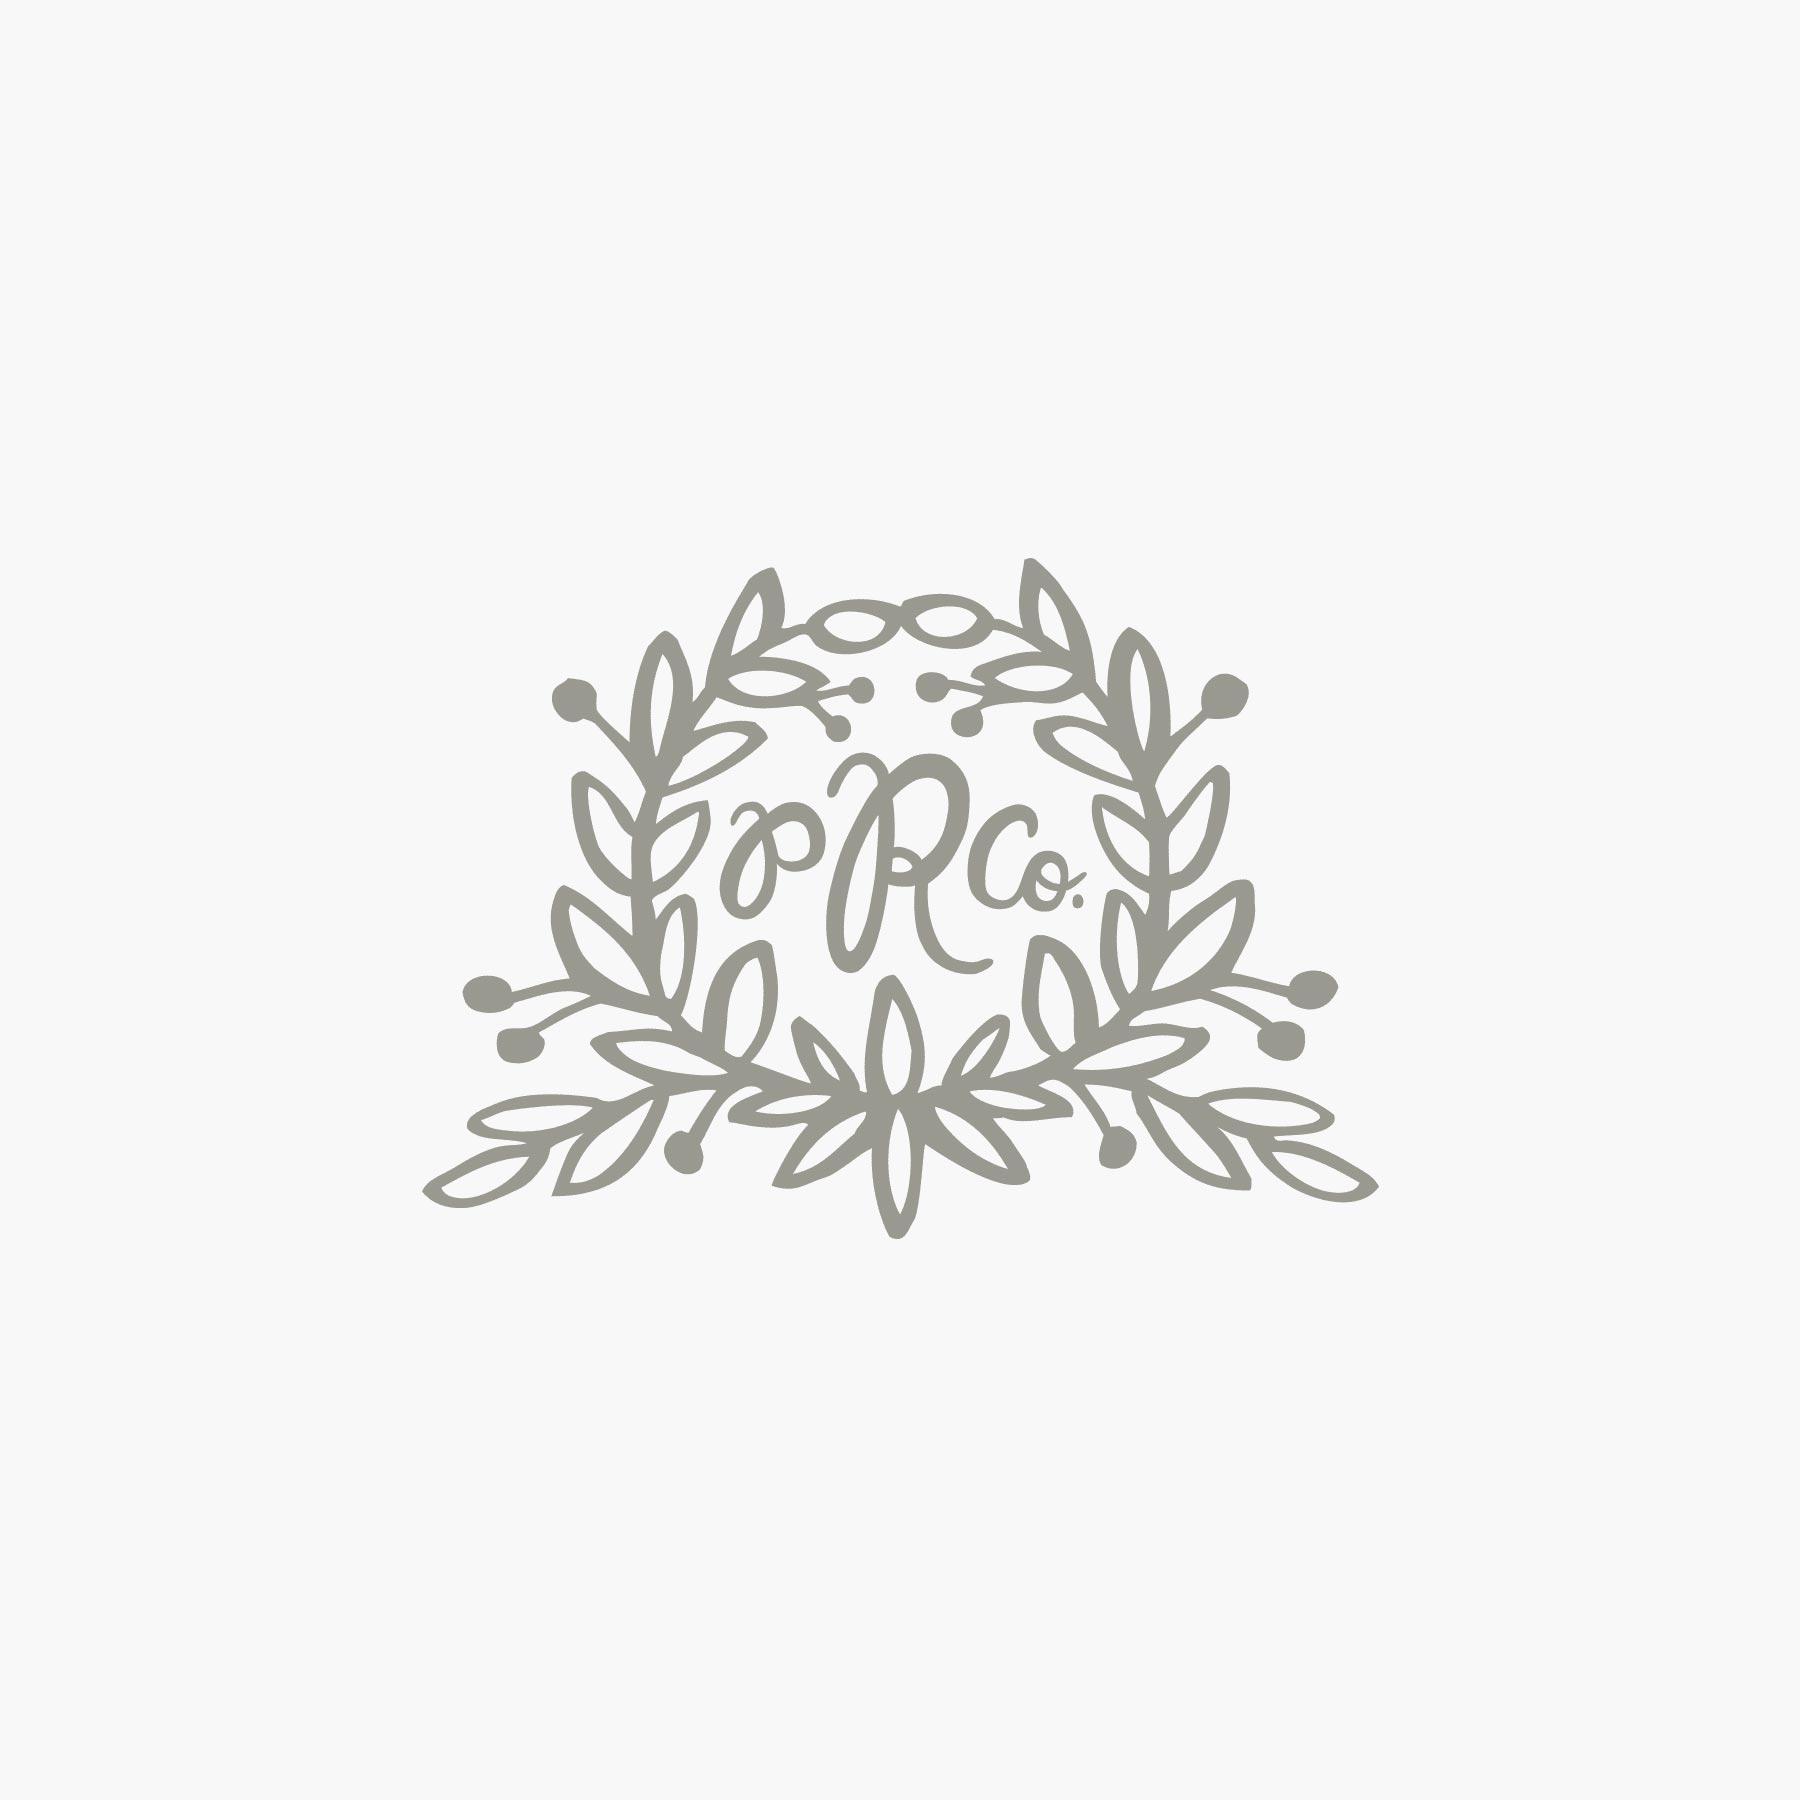 Accent Personalized Flat Notes- Citrus Floral